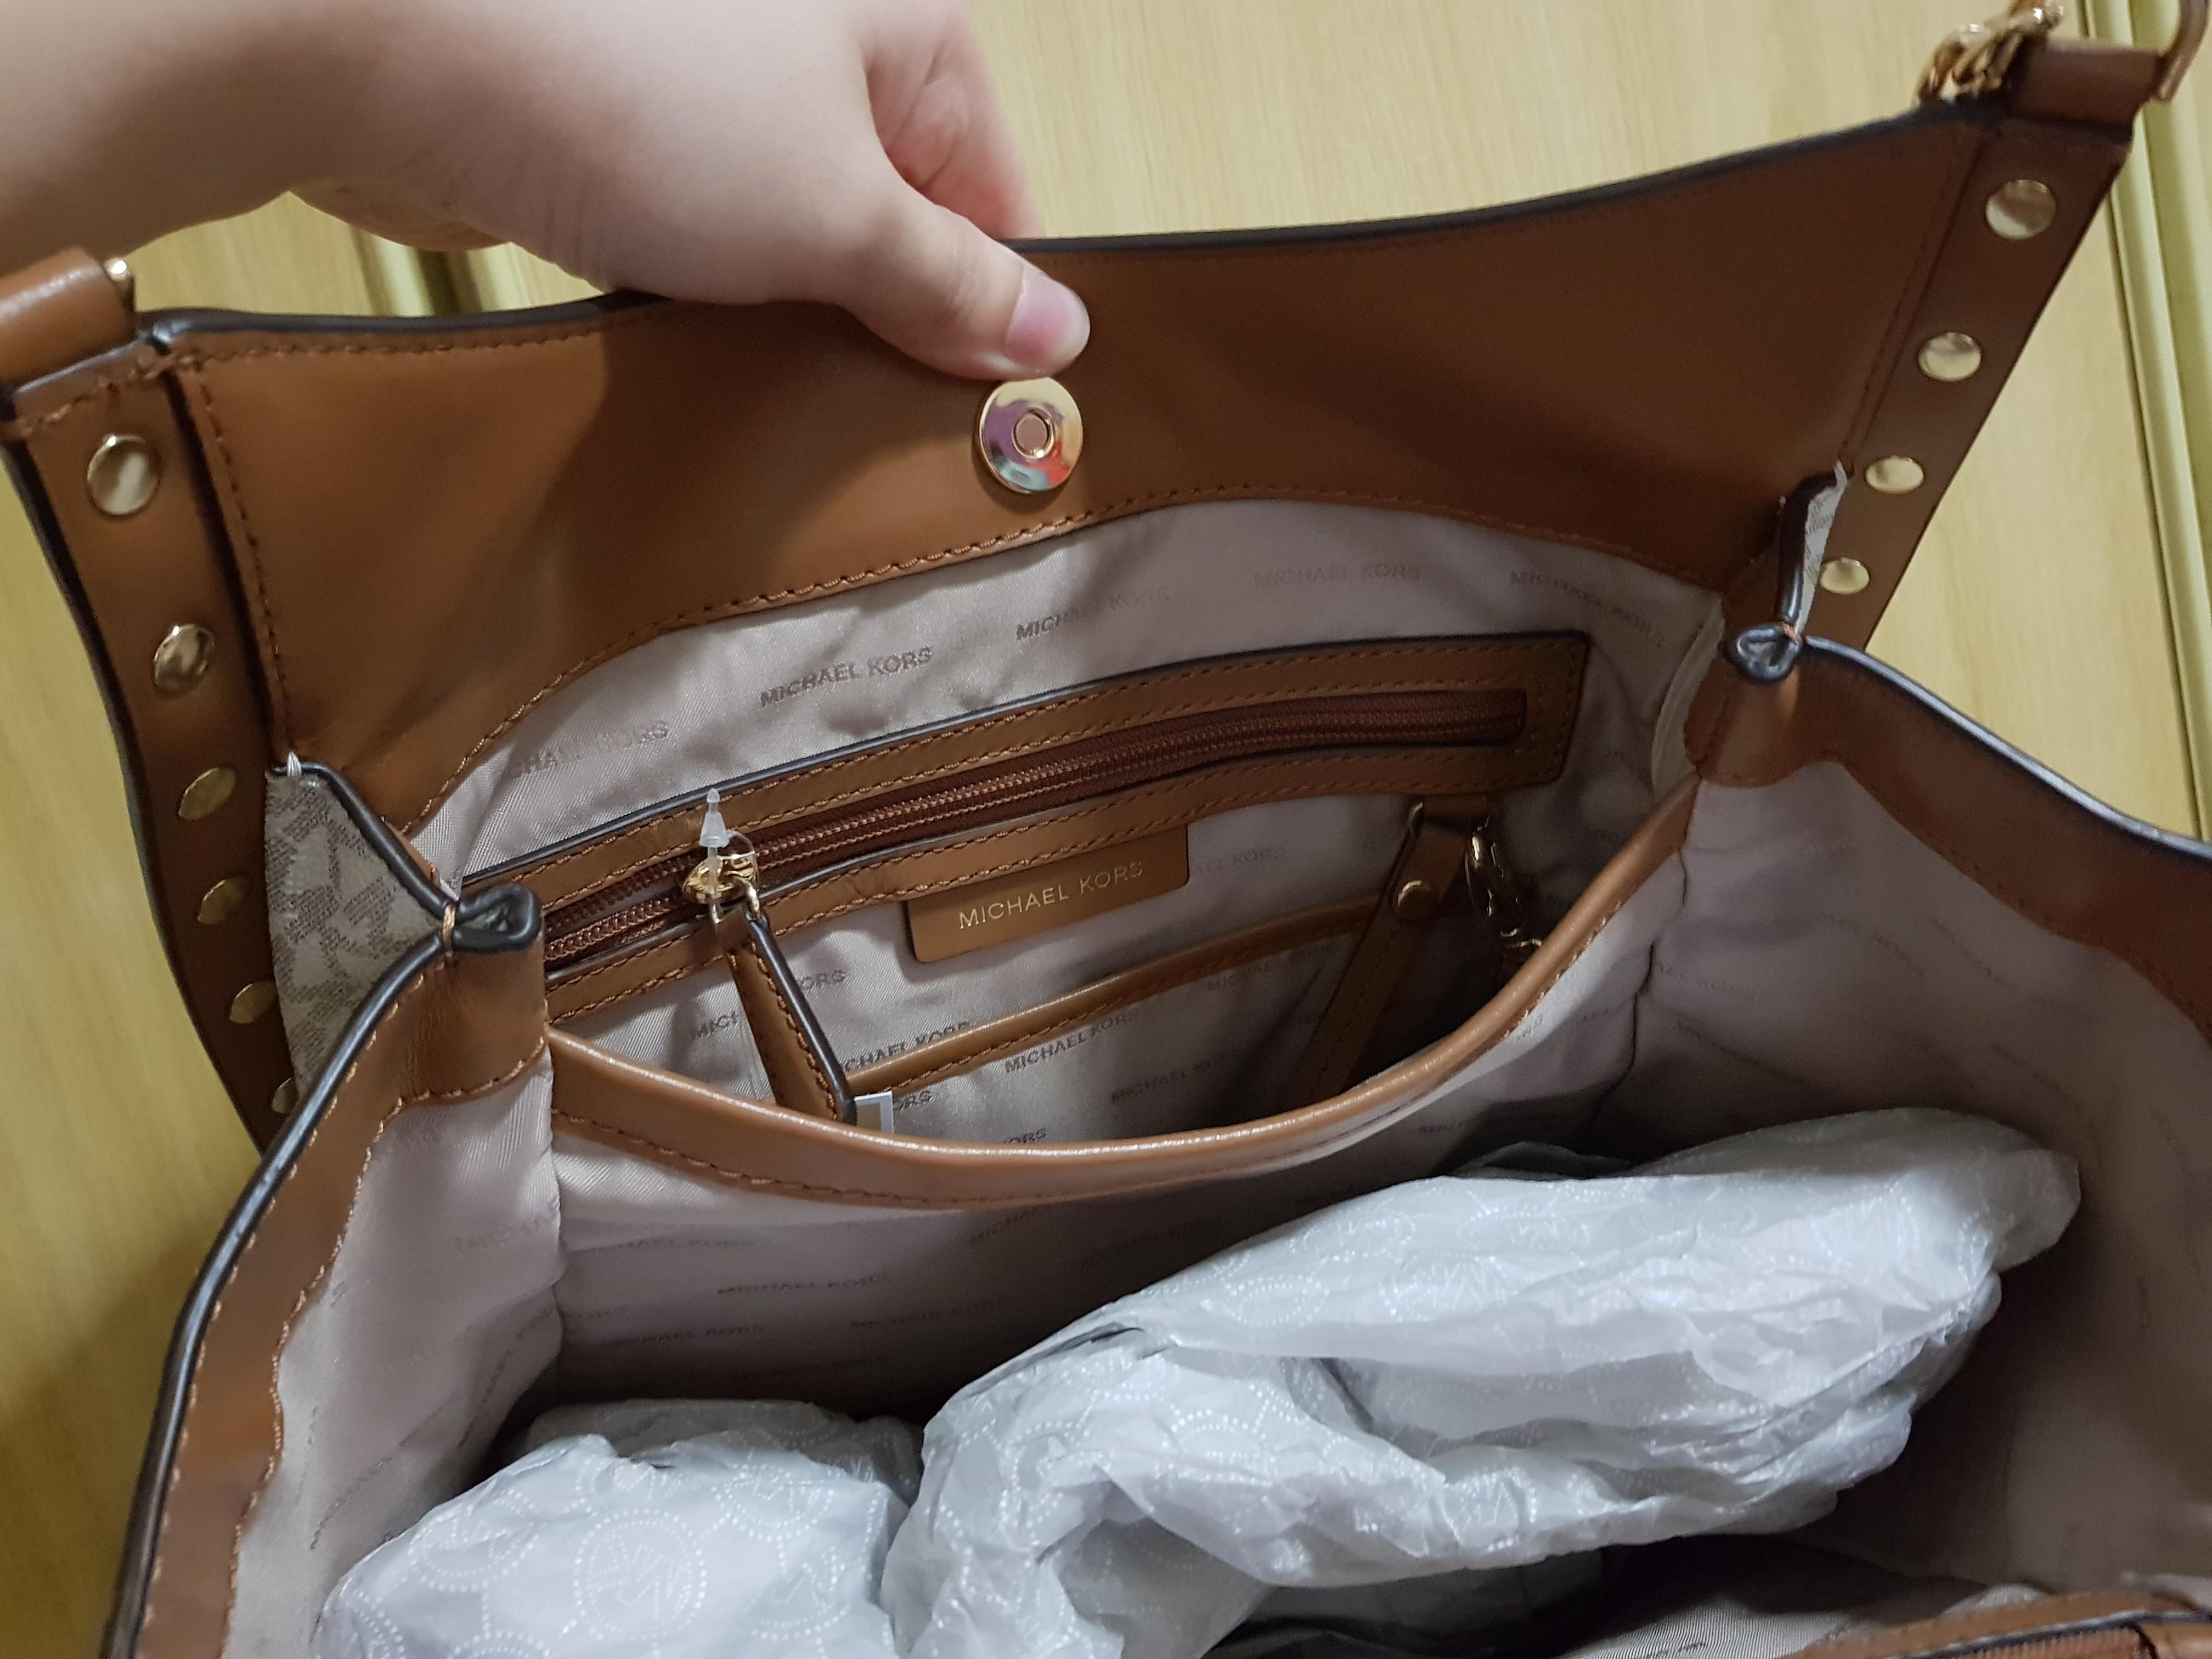 4e5bc97674cead Michael Kors Newbury Chain Tote- Vanilla (100% Authentic) INSTOCK!, Women's  Fashion, Bags & Wallets, Handbags on Carousell